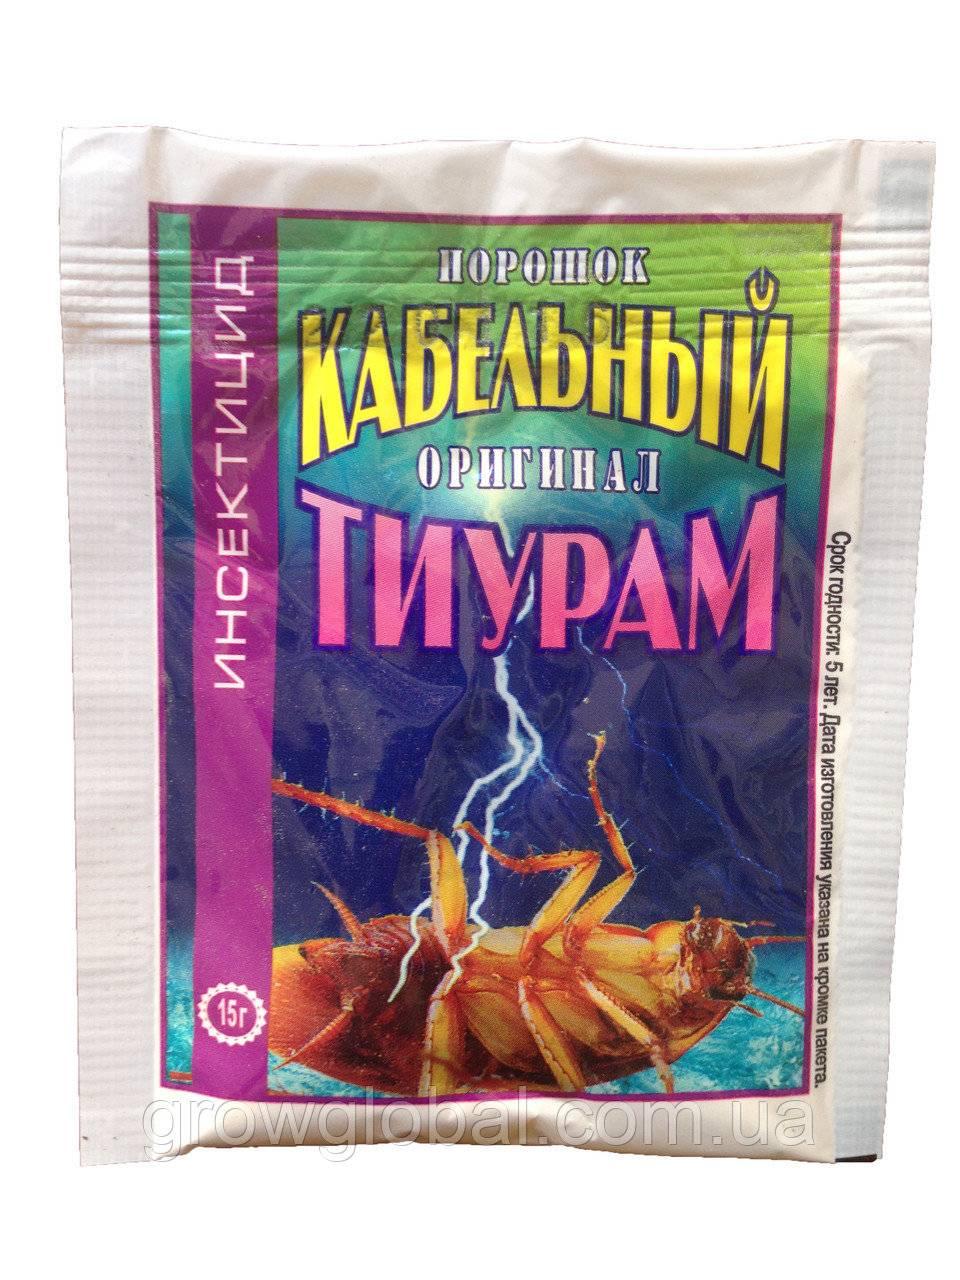 """Тиурам"" от тараканов: достоинства и недостатки"